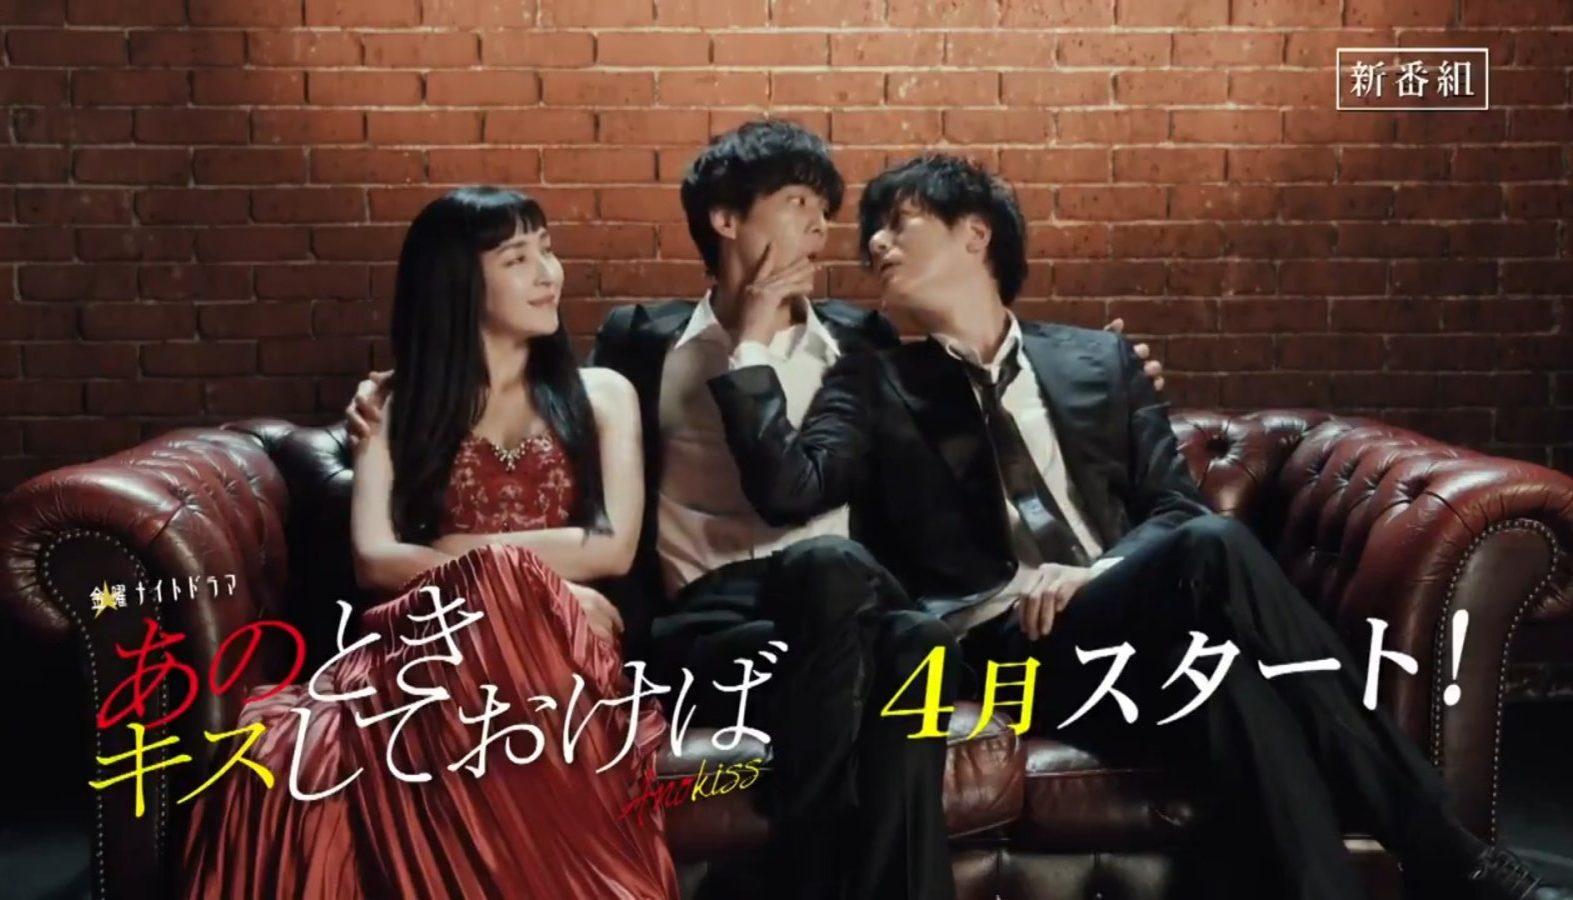 A still from the teaser of Ano Toki Kiss Shite Okeba